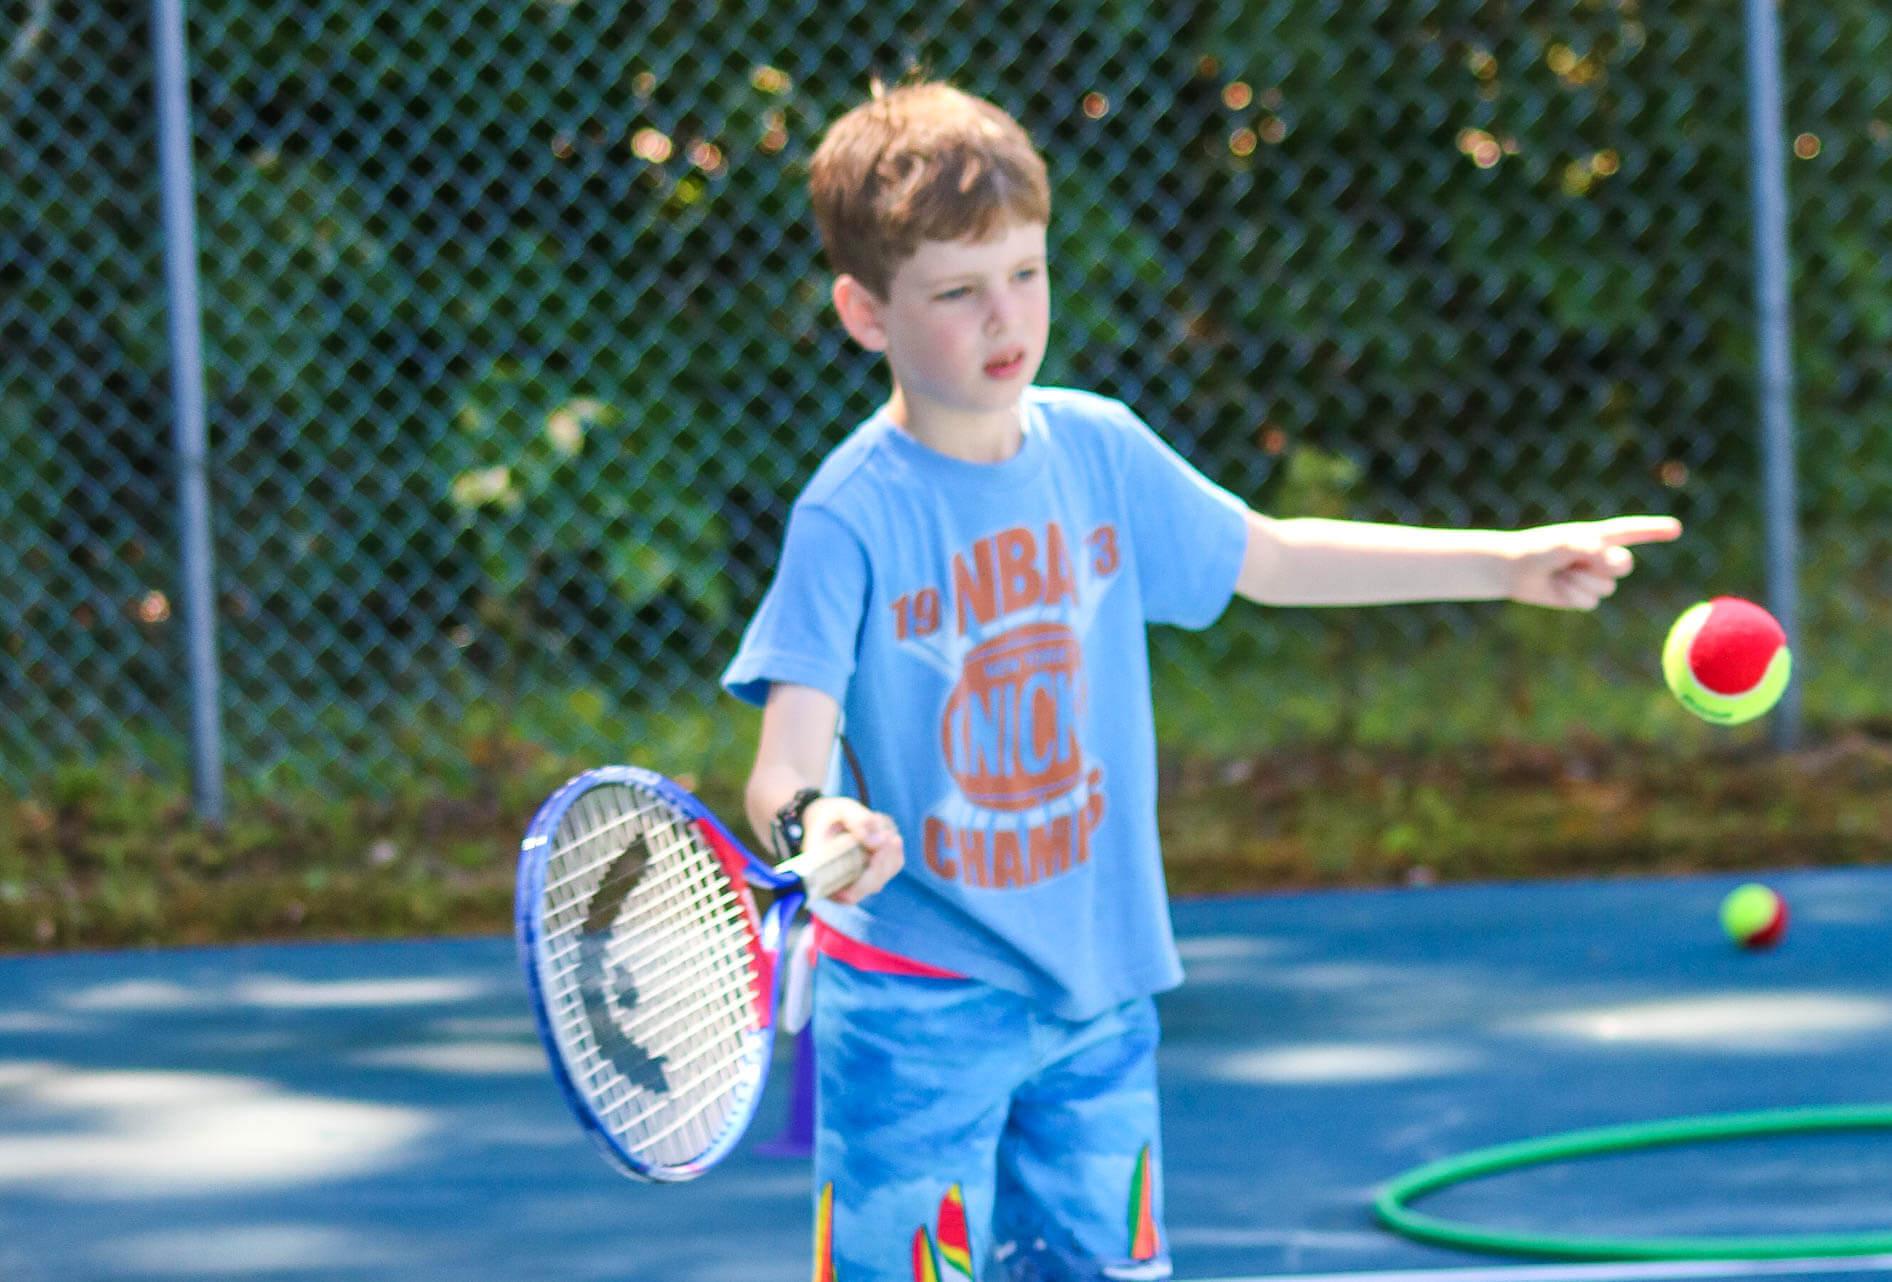 Young camper swings tennis racquet